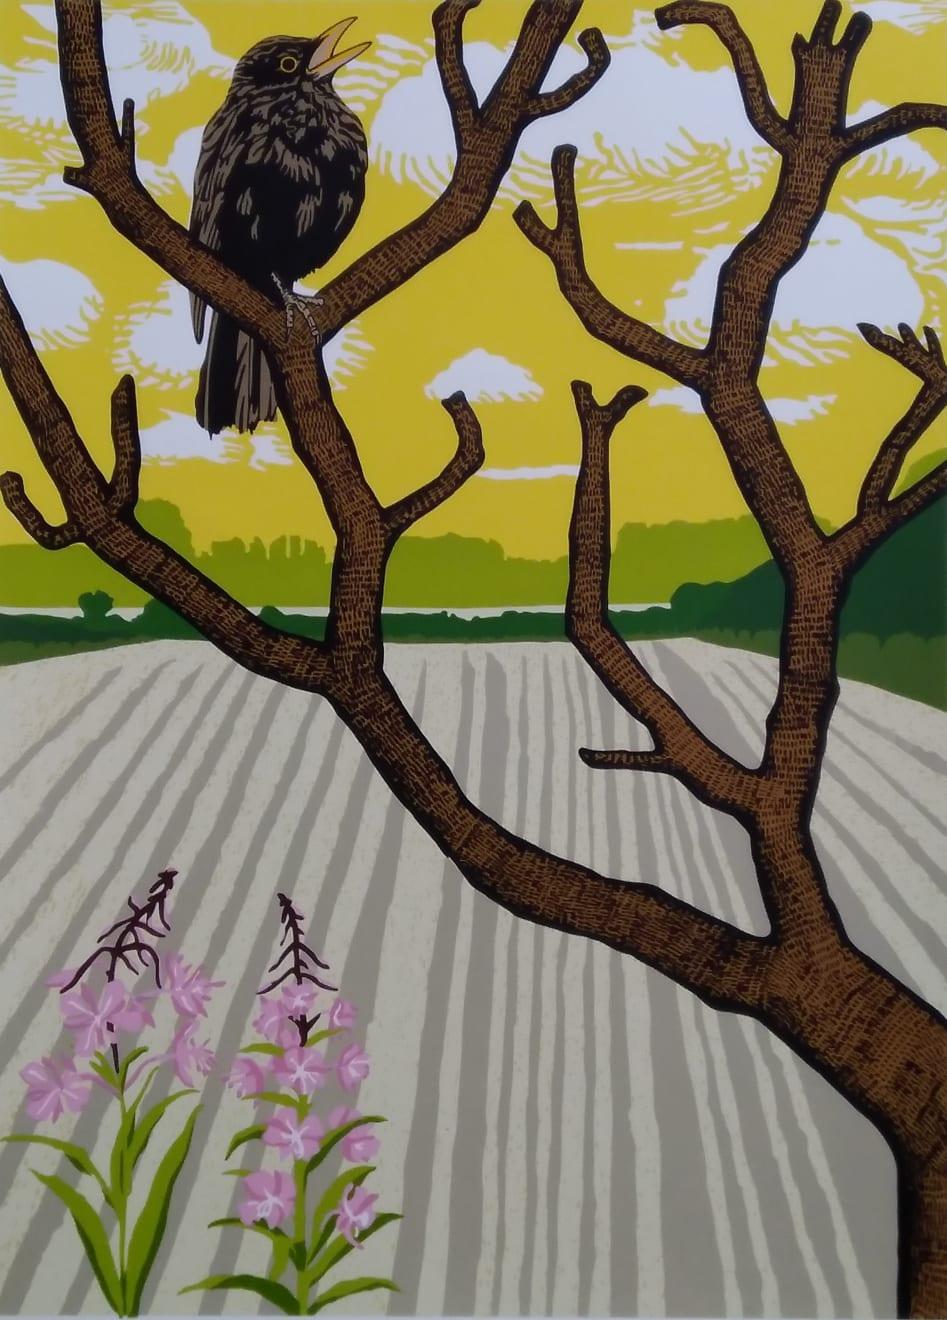 Paul Hogg, Blackbird in a Tree, Singing, 2016